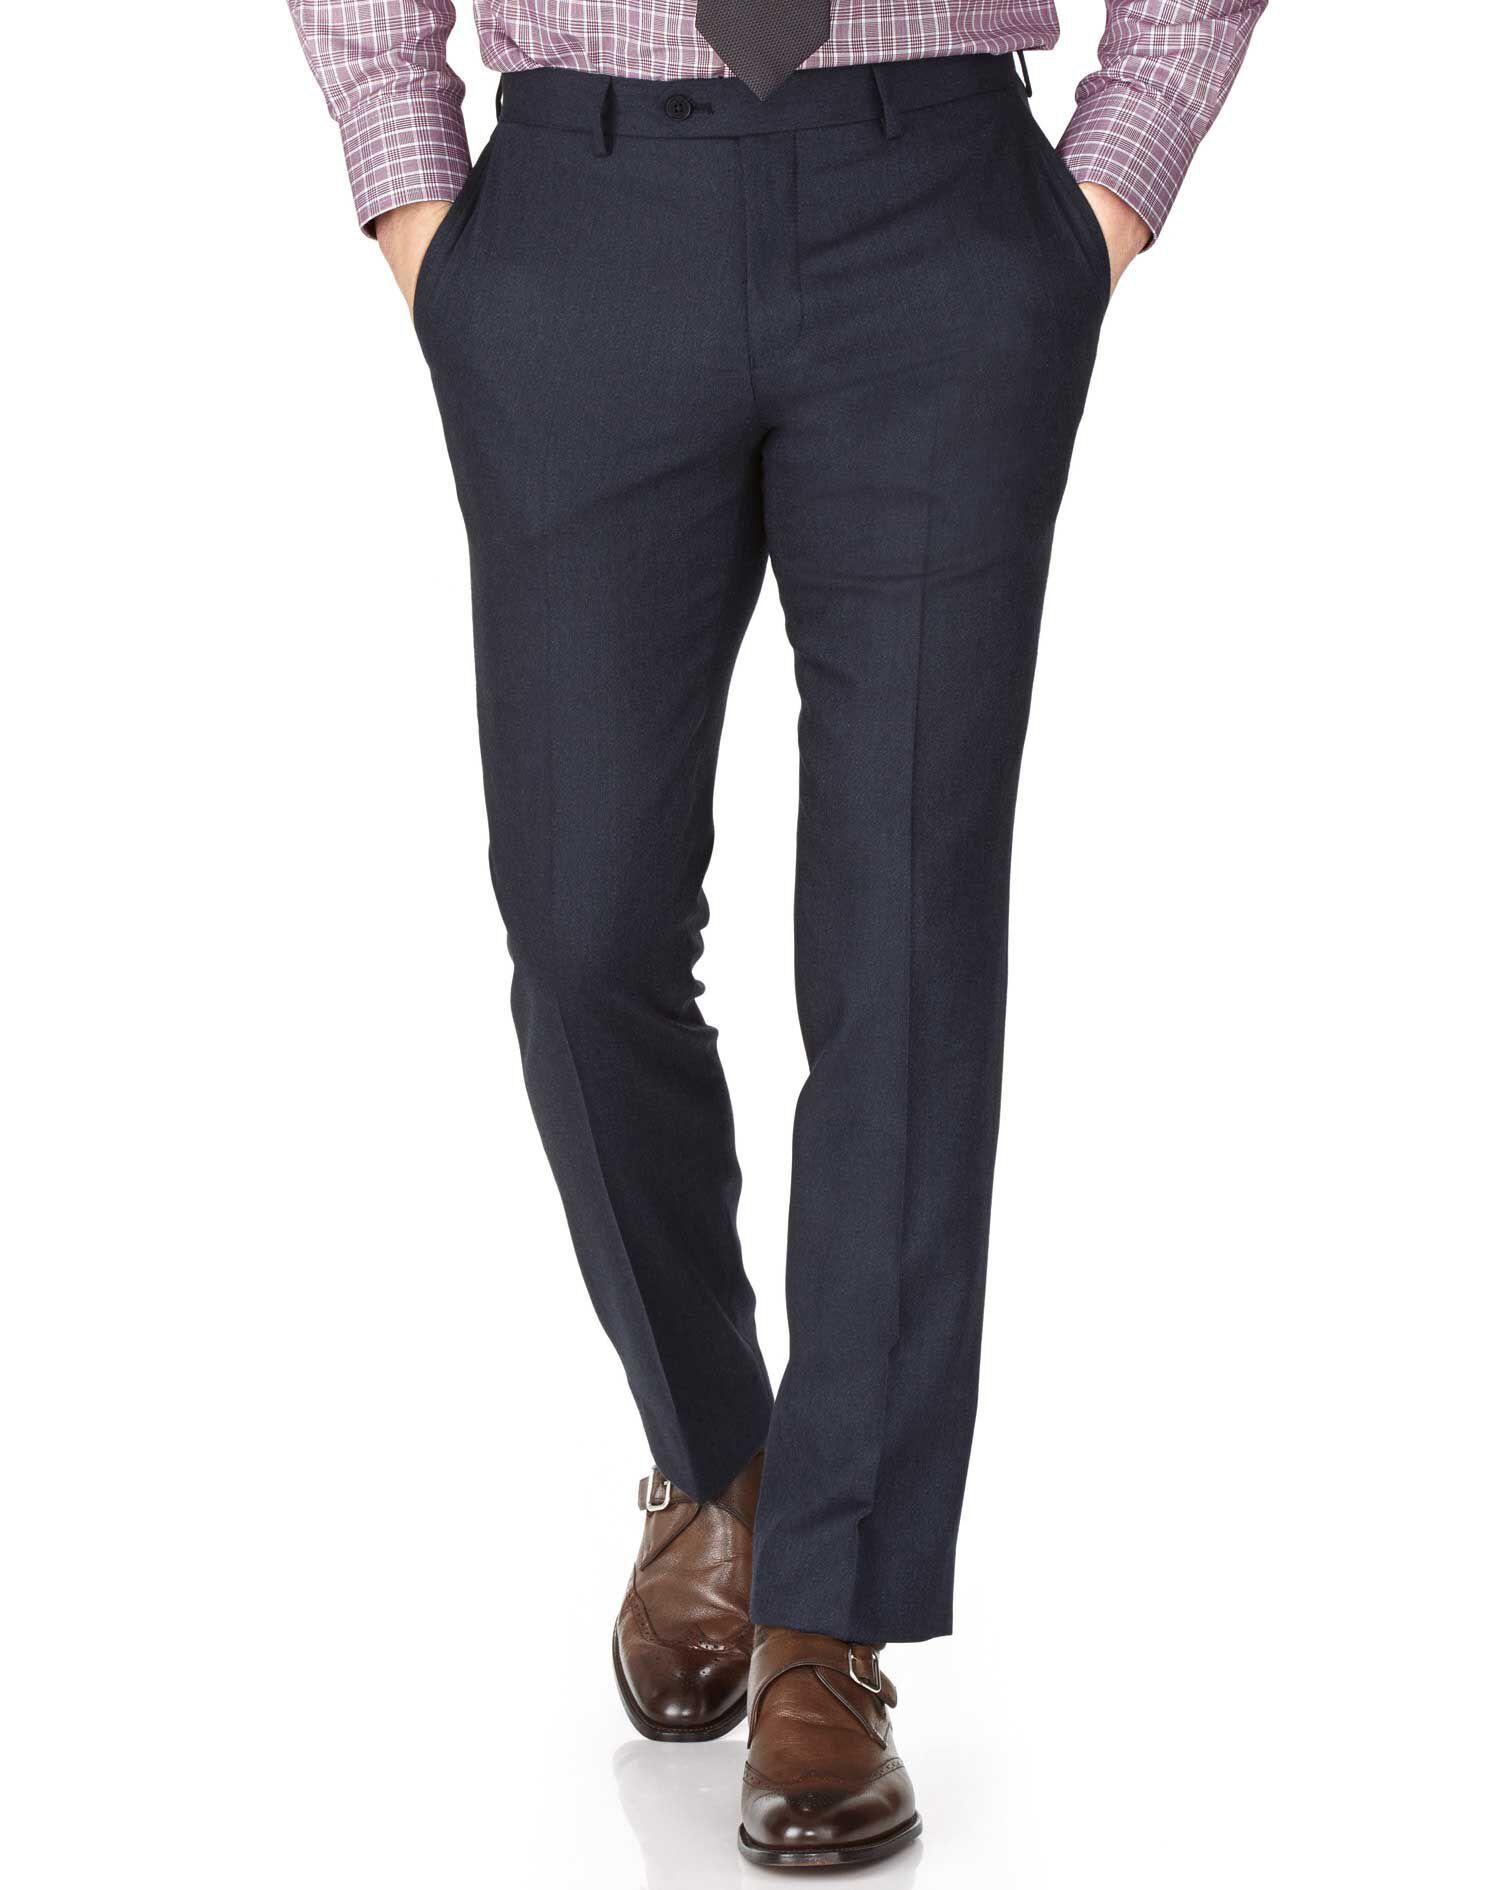 Indigo Slim Fit Saxony Business Suit Trousers Size W30 L38 by Charles Tyrwhitt